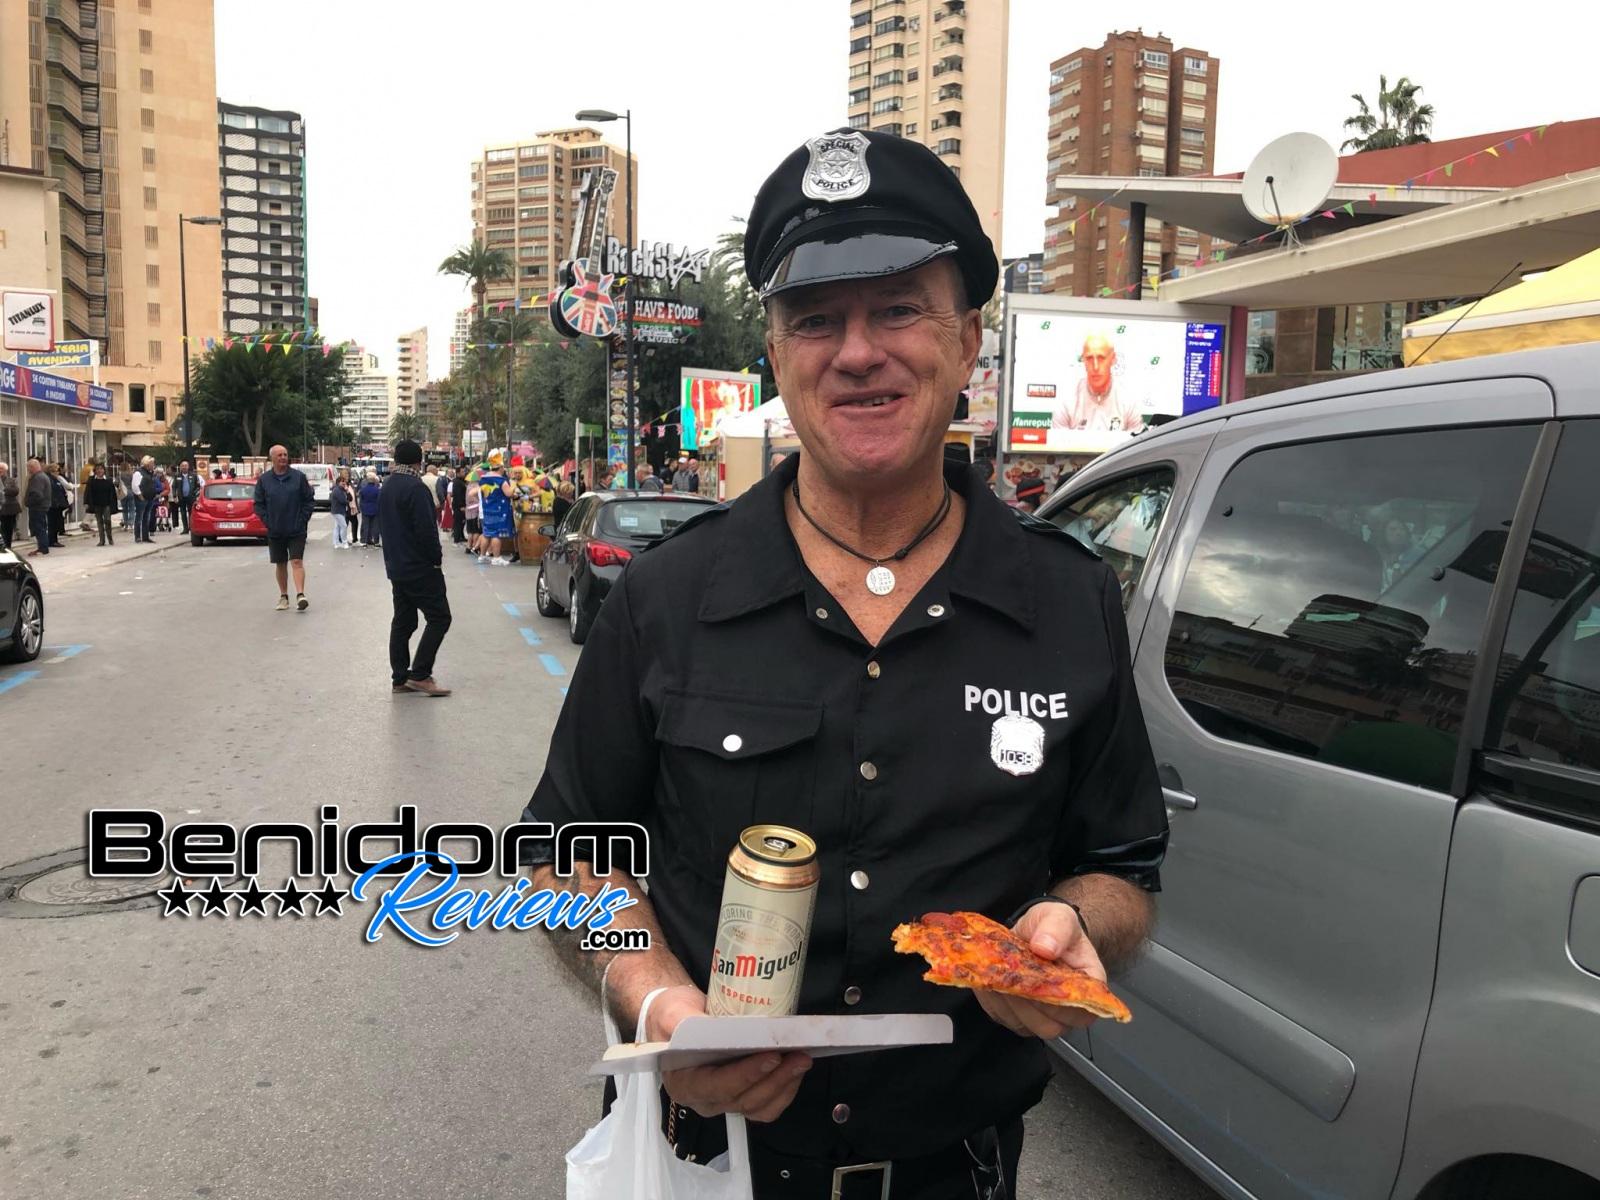 Benidorm-Fiestas-2019-Fancy-Dress-155